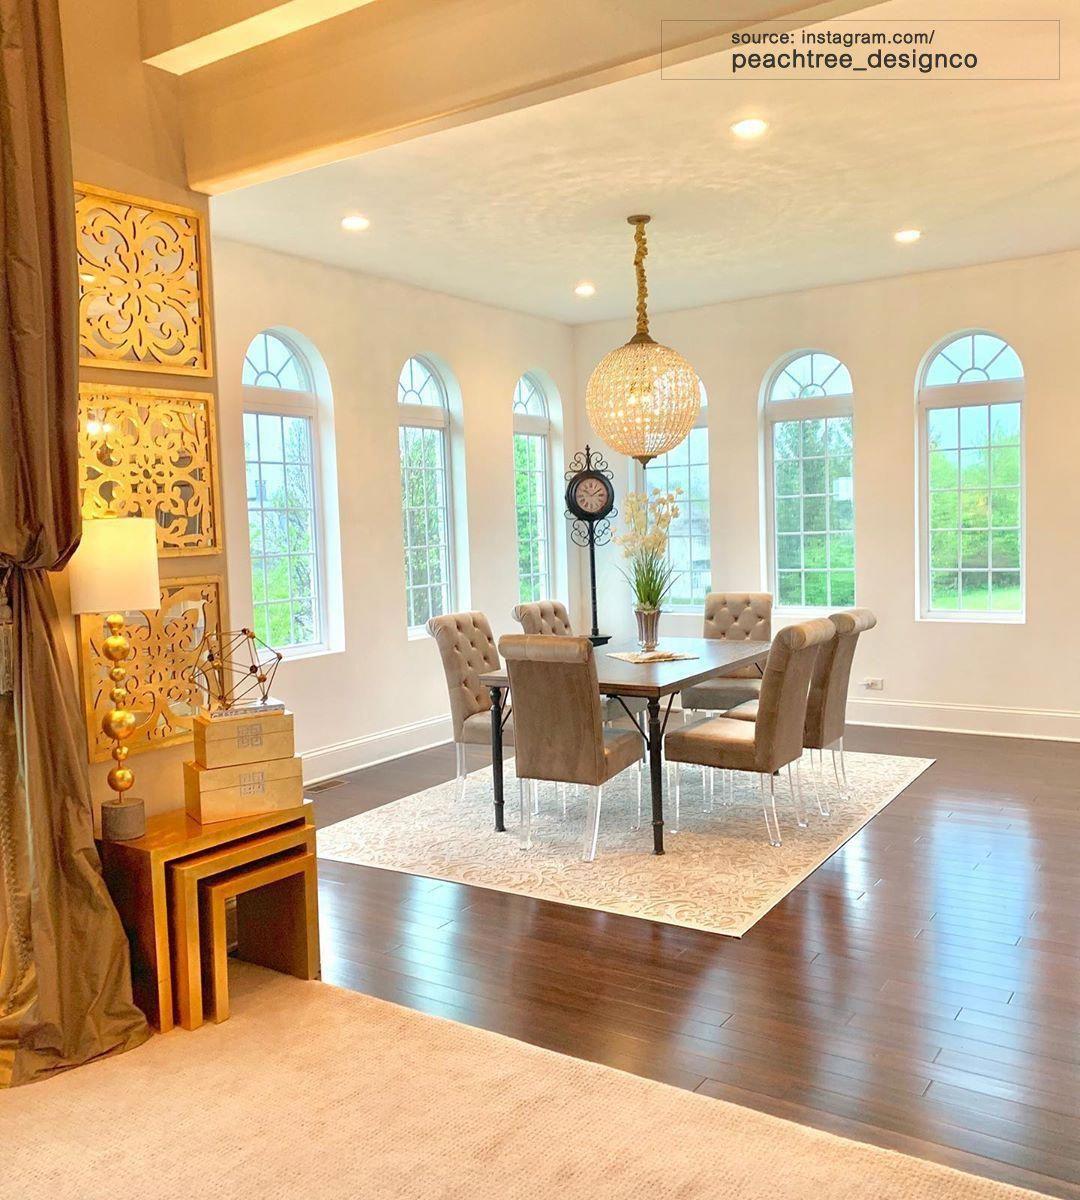 Greatest Home Decorating Goods #livingroomdecoration